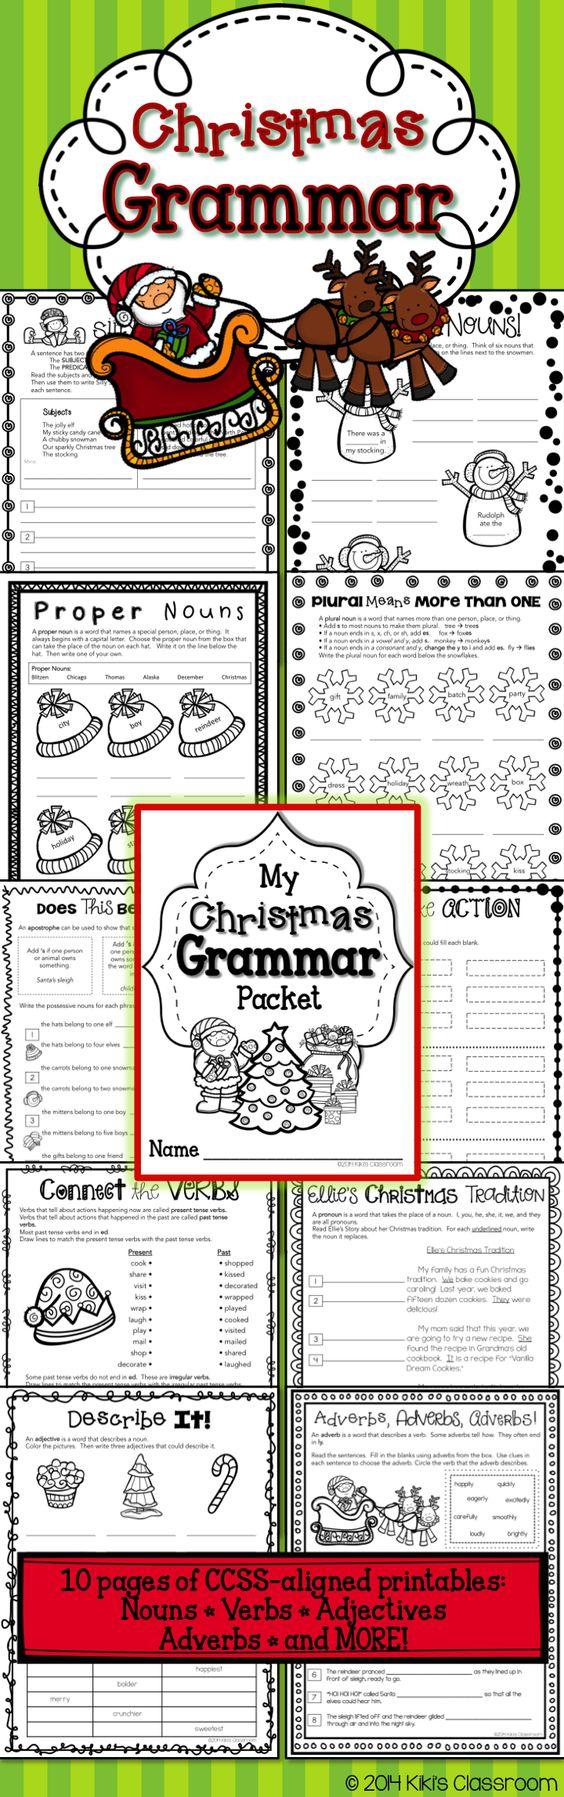 3rd grade christmas activities 3rd grade christmas grammar parts of speech pinterest. Black Bedroom Furniture Sets. Home Design Ideas